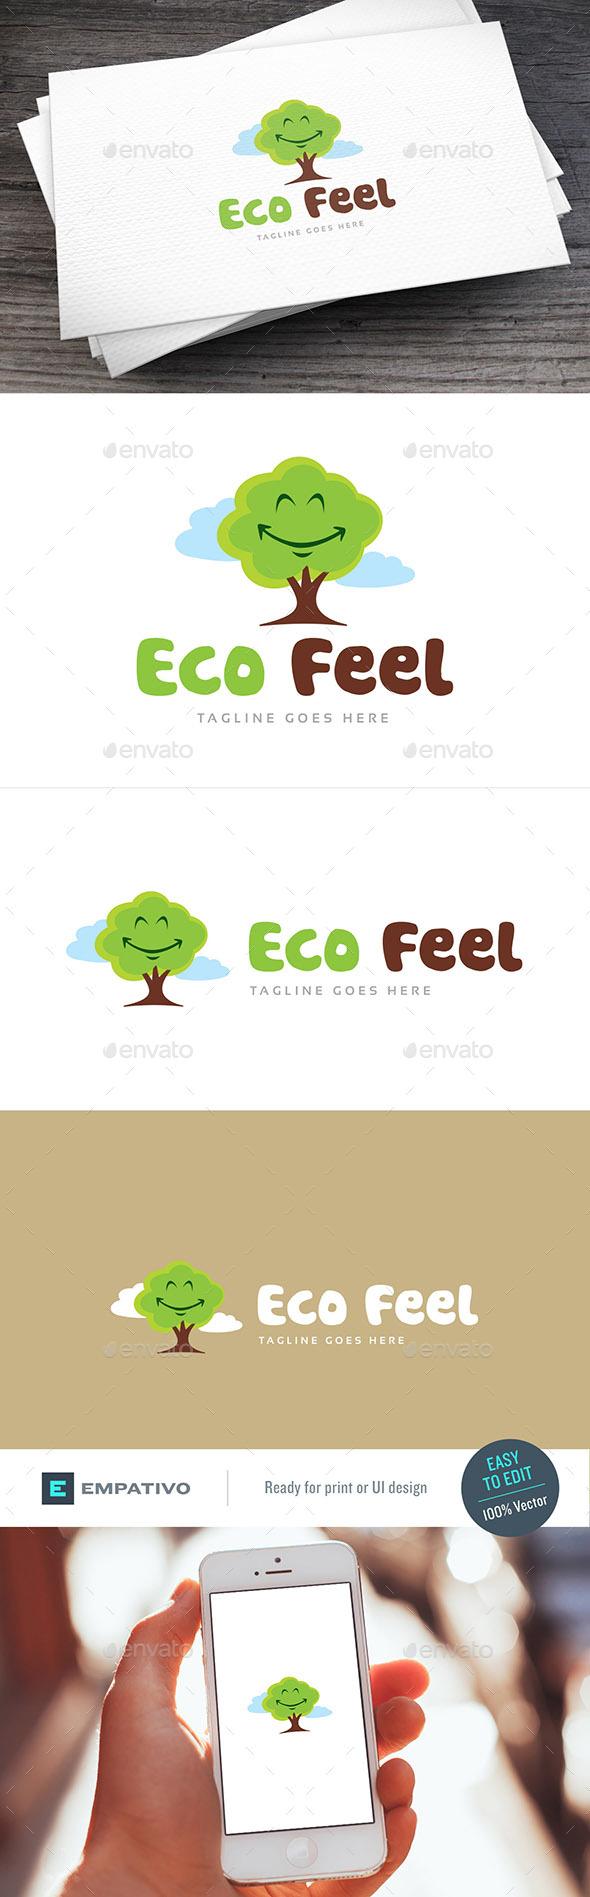 Eco Feel Logo Template - Nature Logo Templates